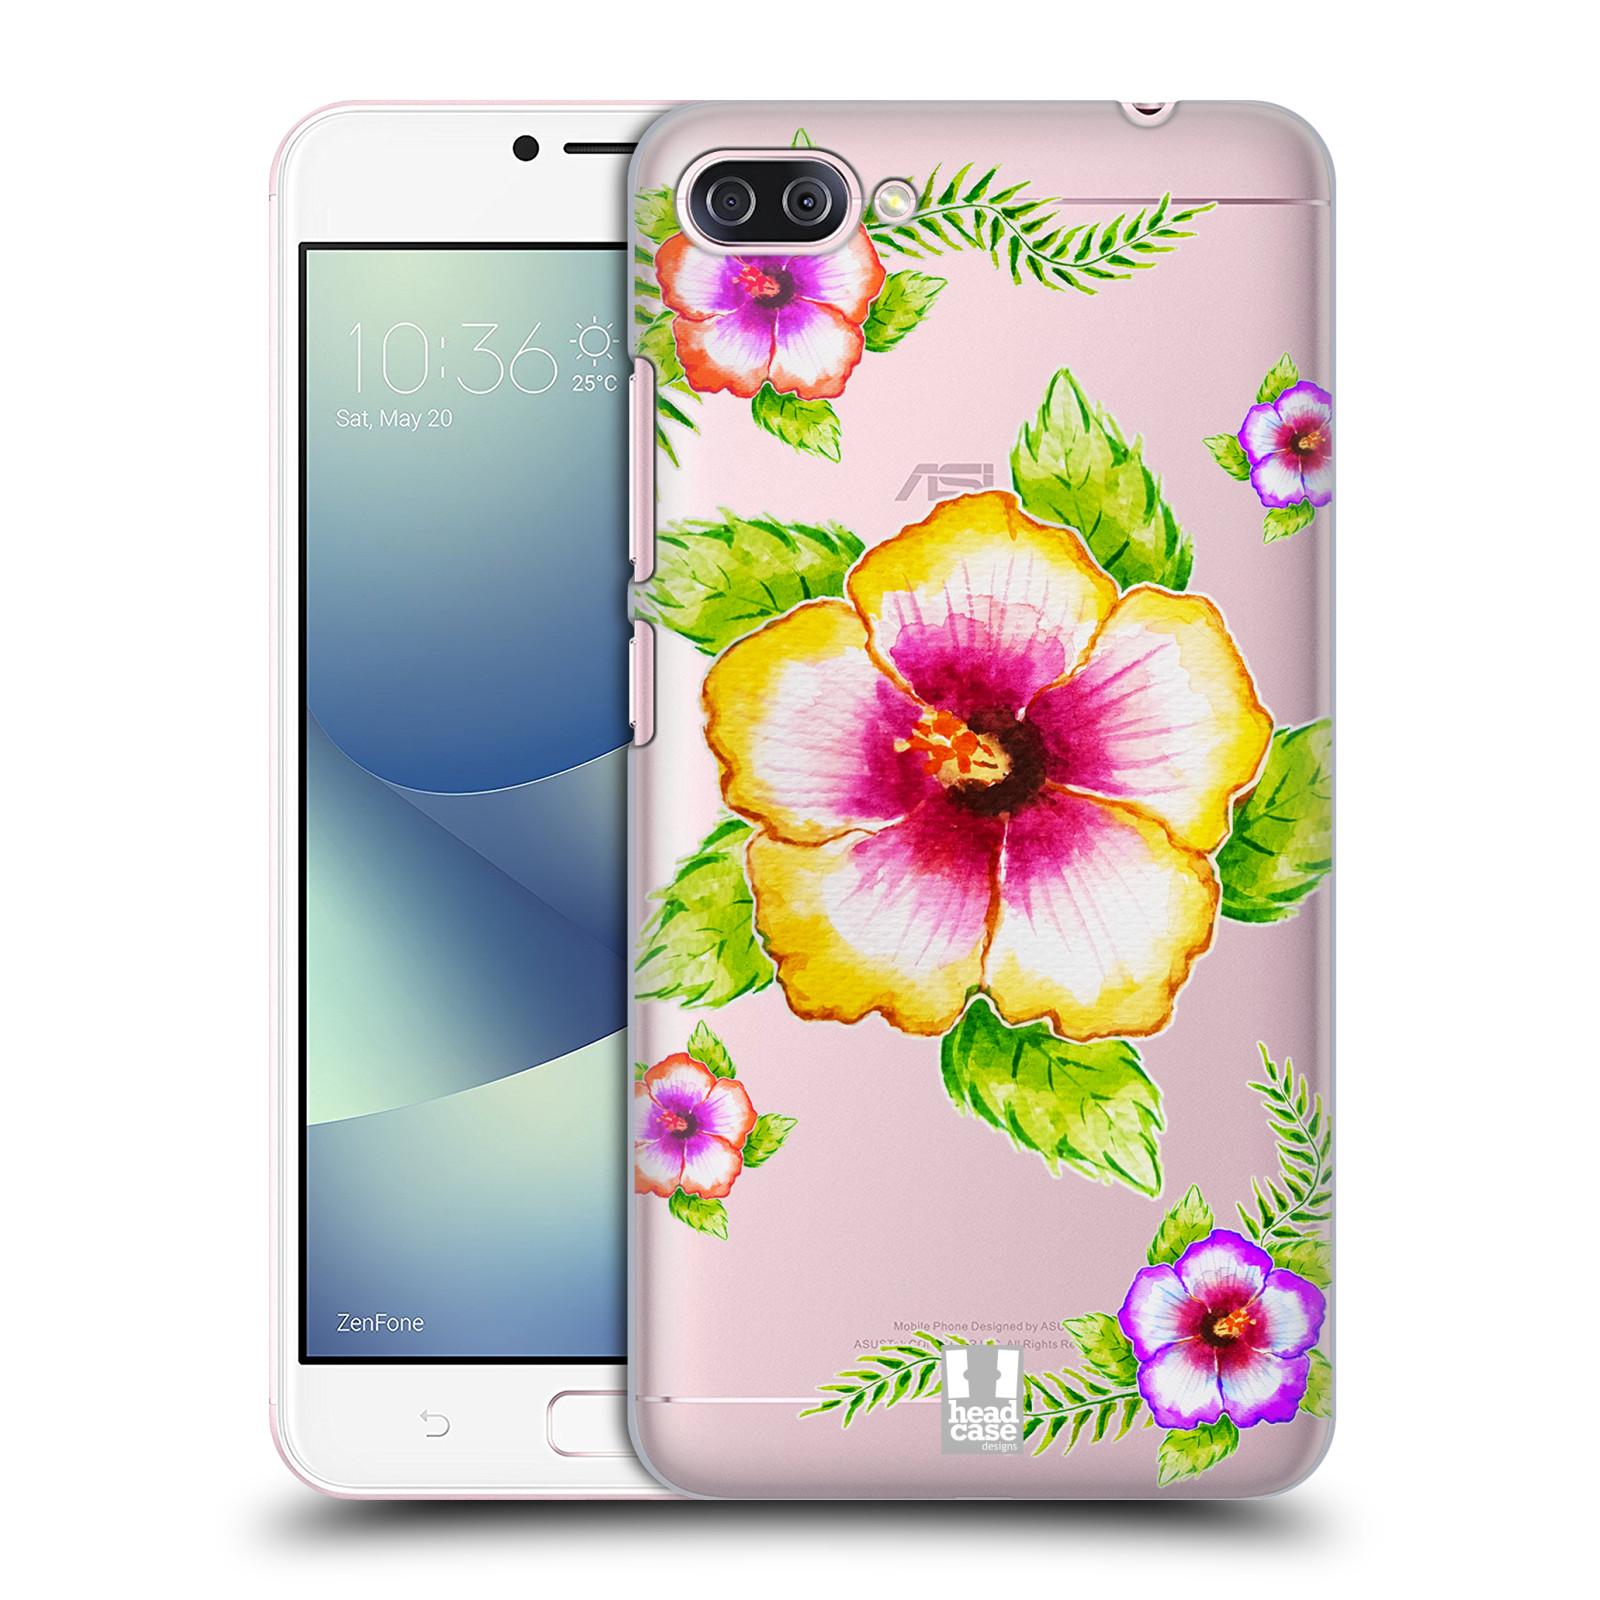 HEAD CASE plastový obal na mobil Asus Zenfone 4 MAX ZC554KL Květina Ibišek vodní barvy